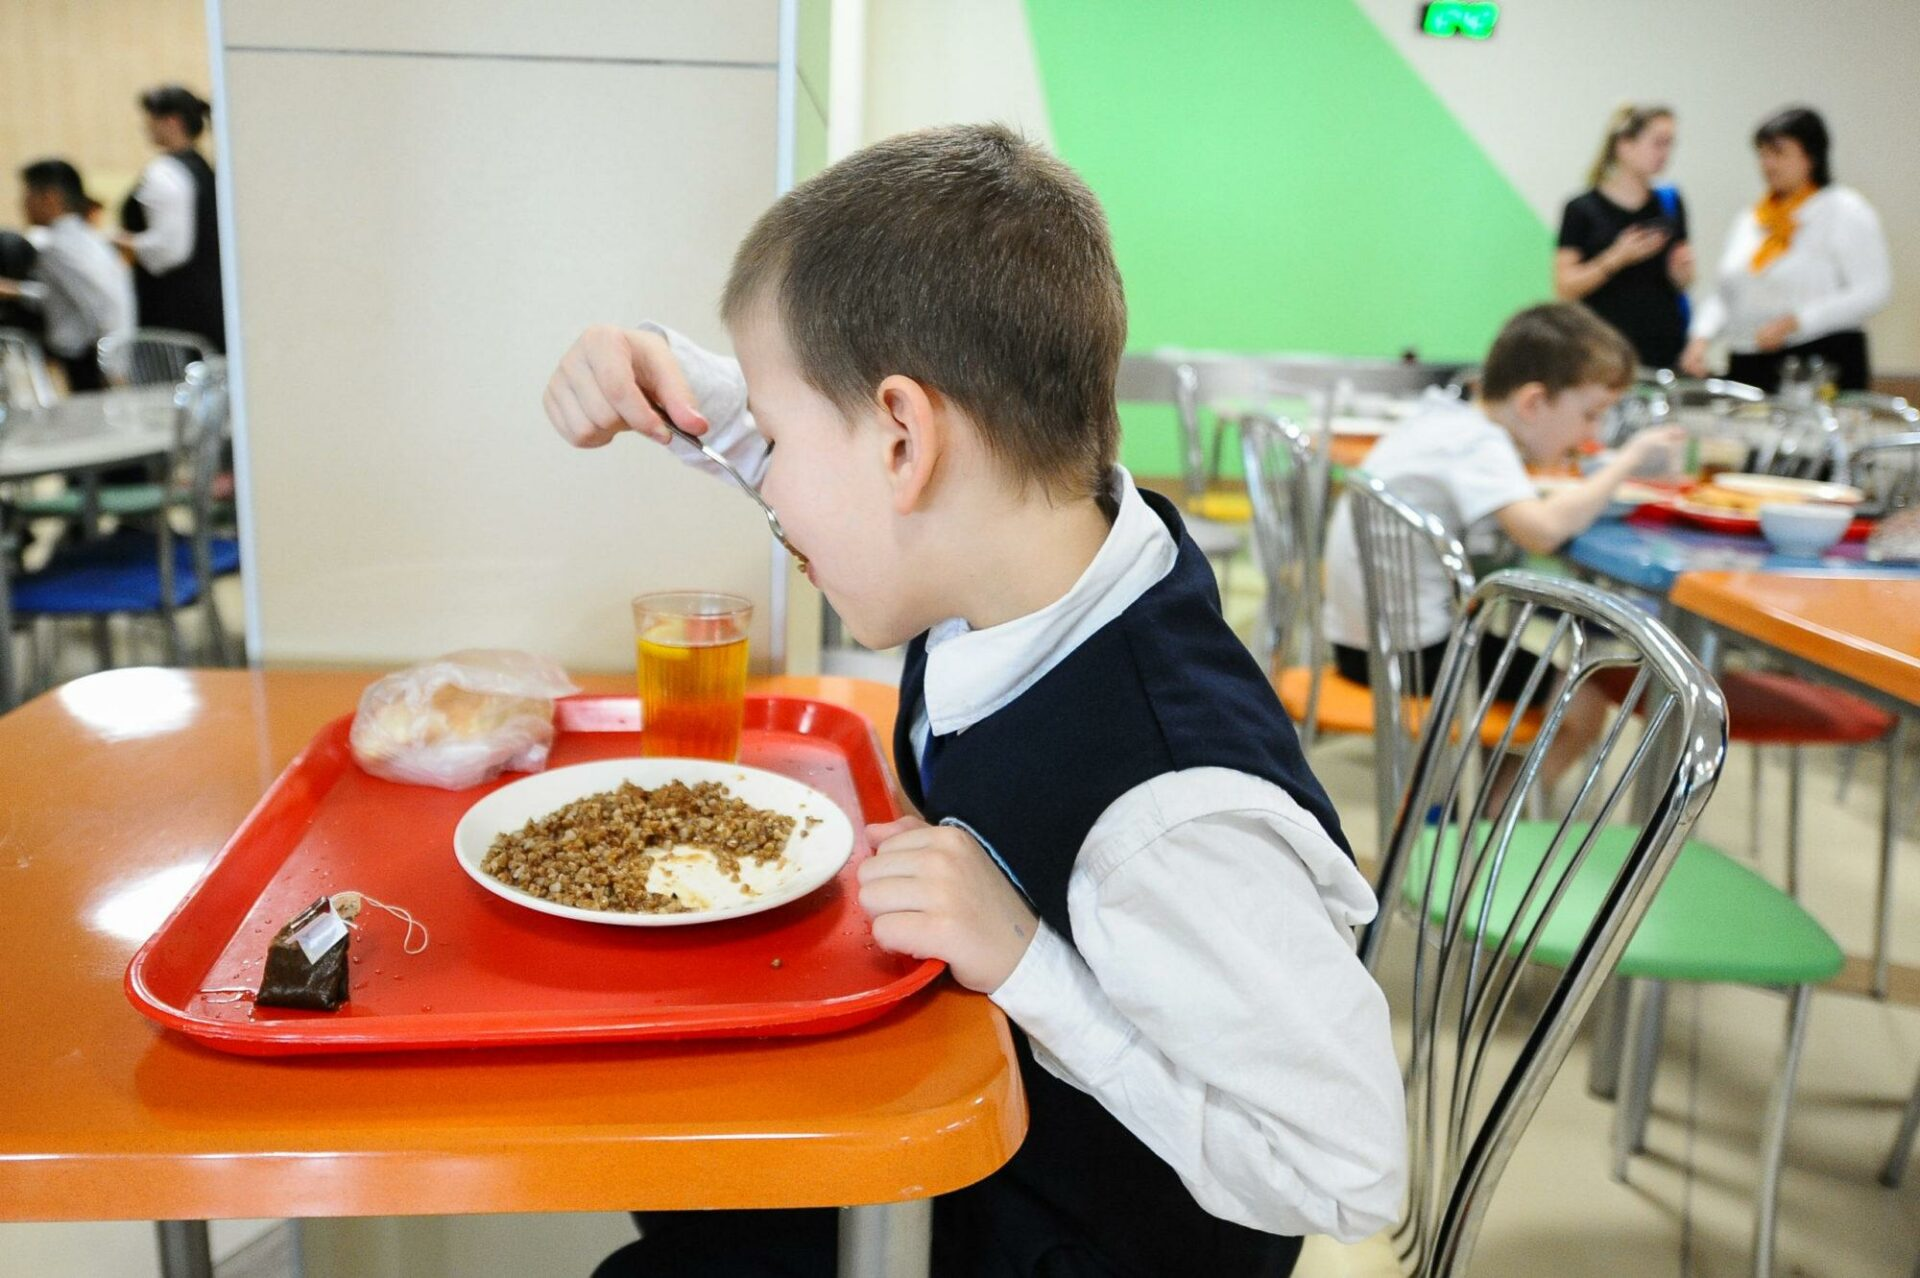 В школах Марий Эл изменили нормативы питания